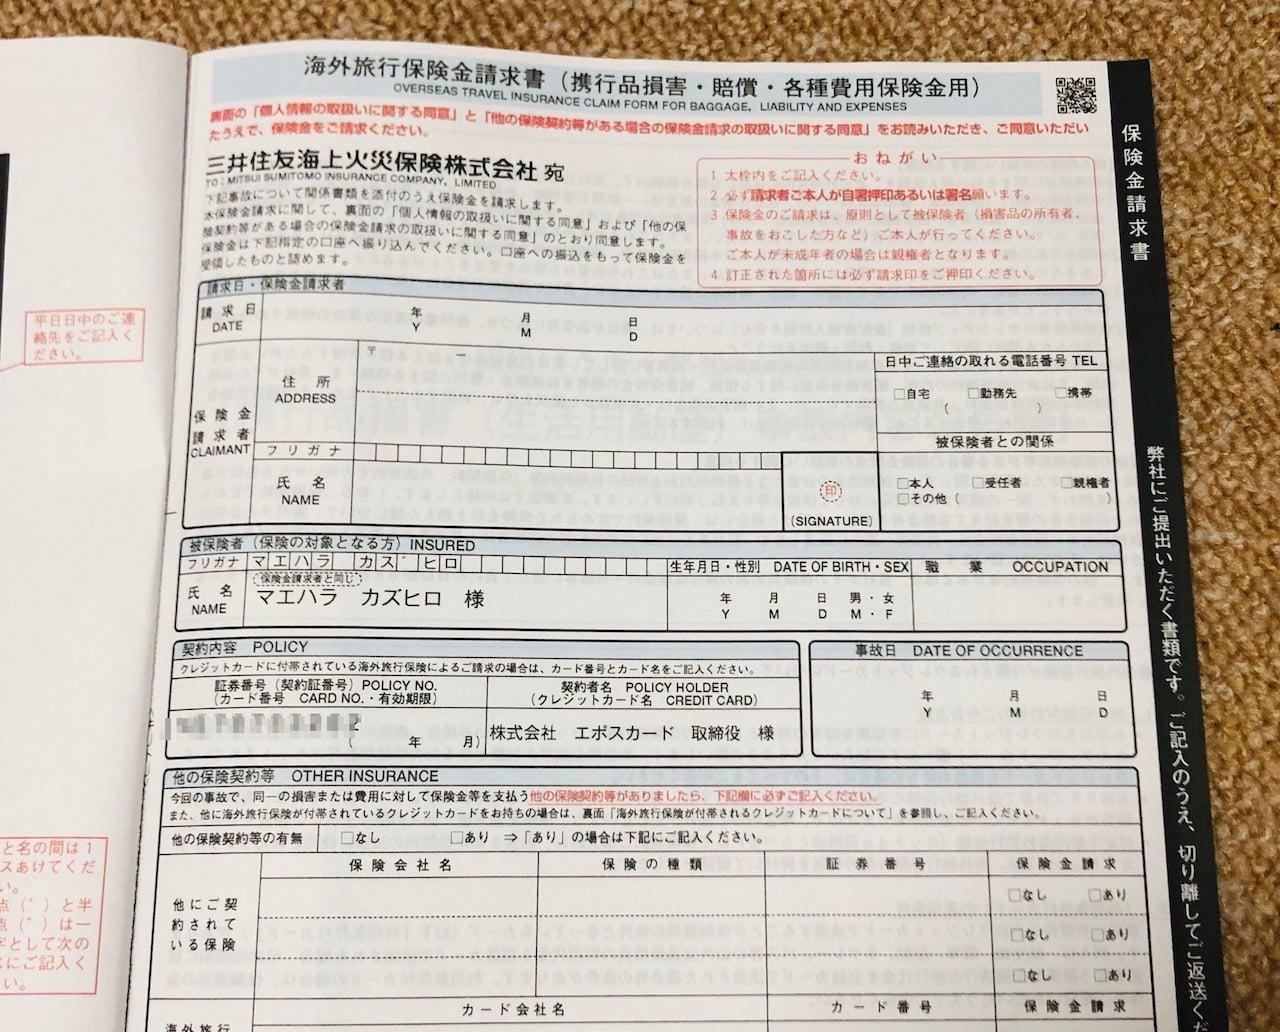 Eposcard inshurance macbookpro 00088